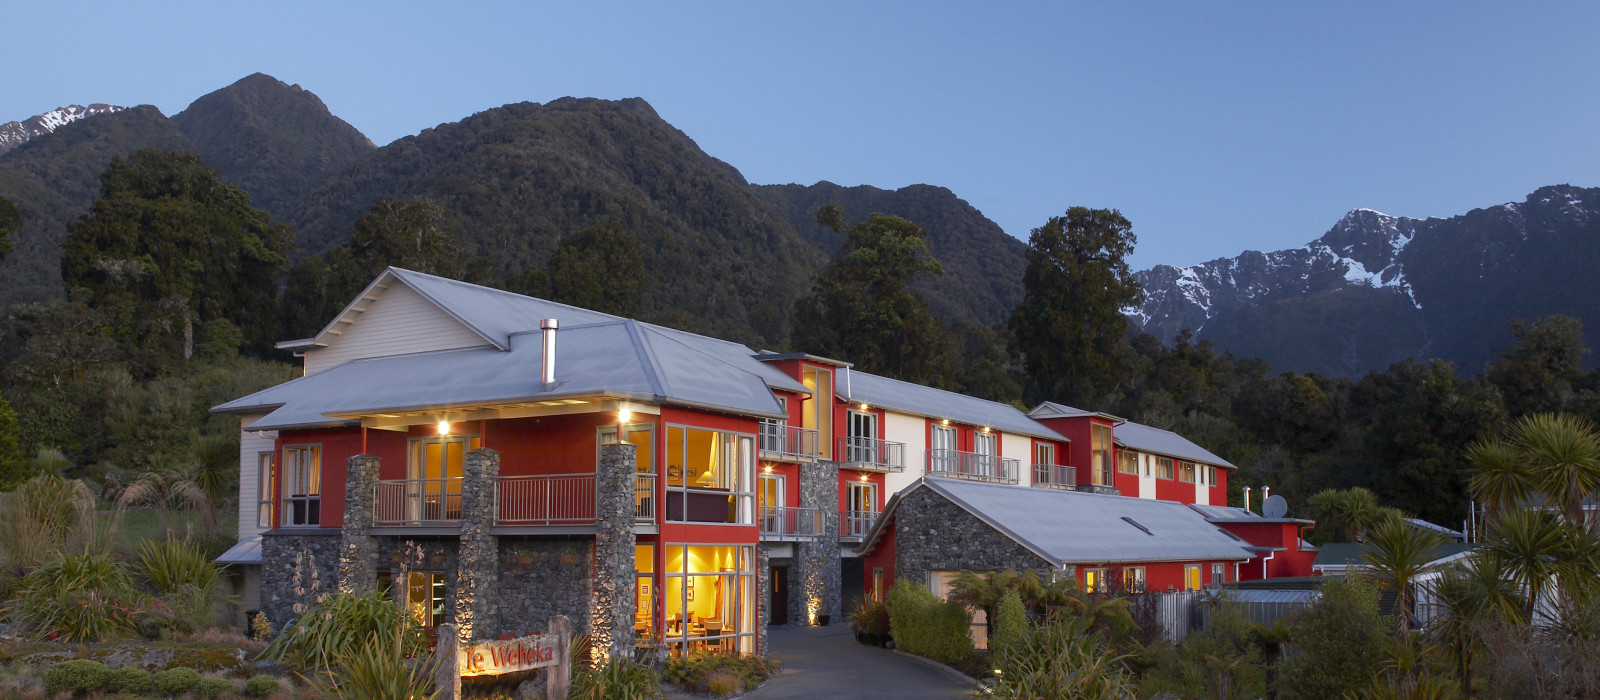 Hotel Distinction  Fox Glacier Neuseeland